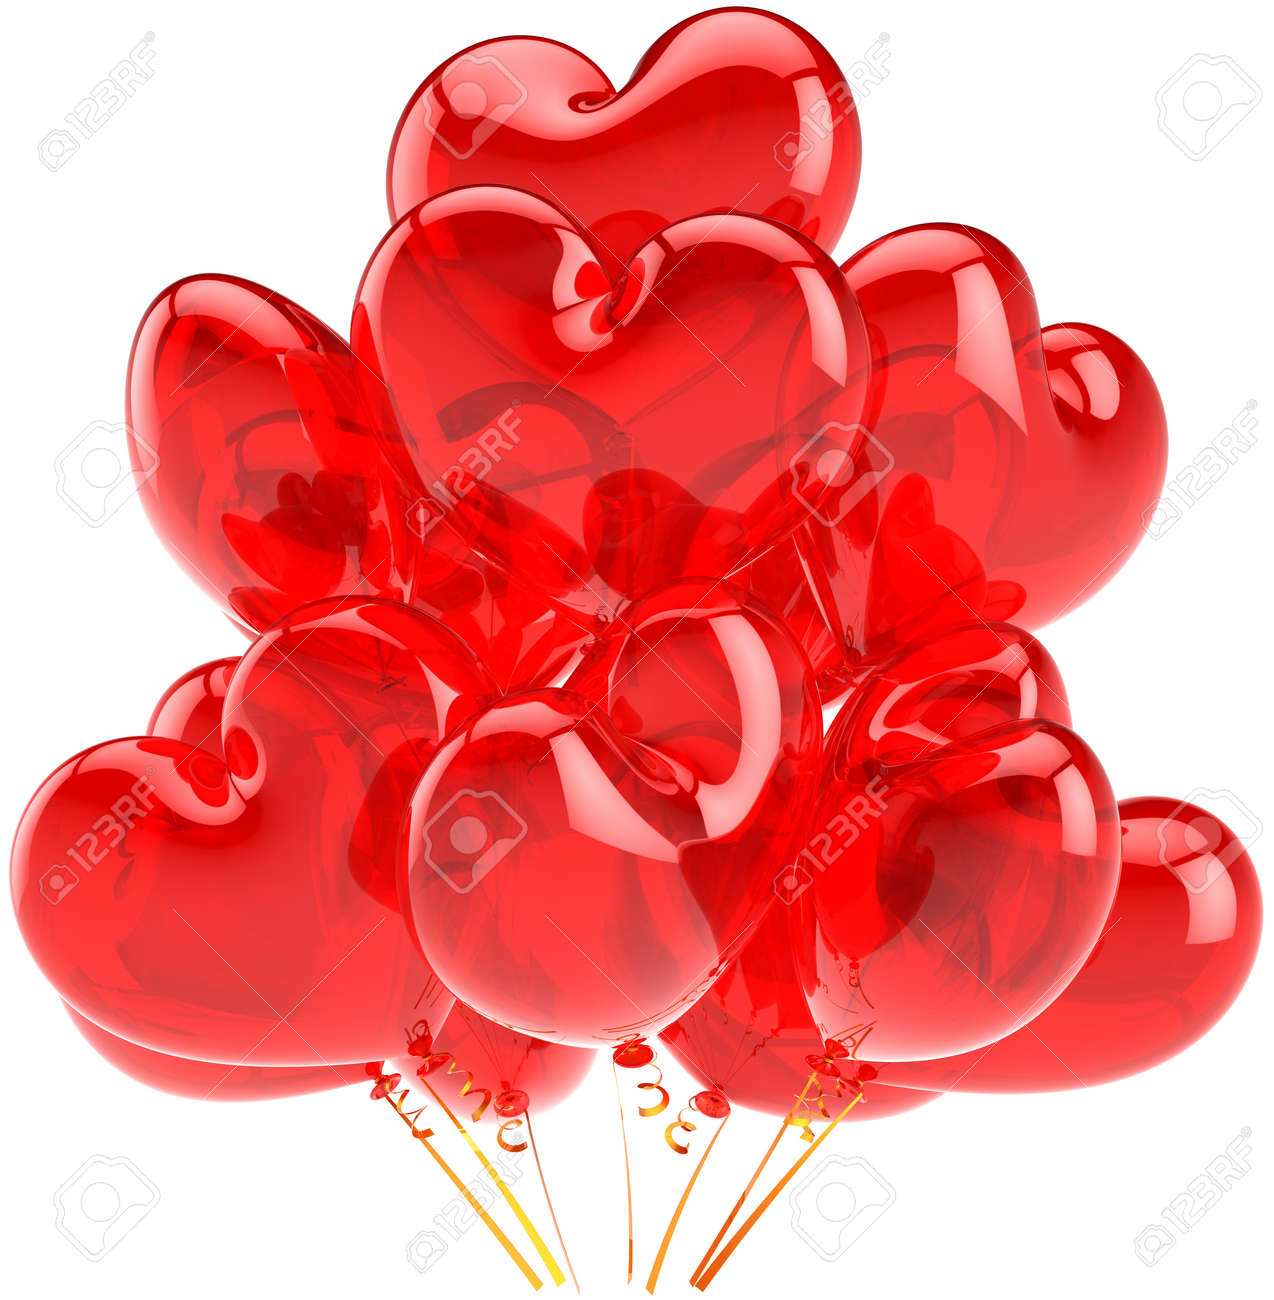 Red Party Ballons Transluzente Herzformiges Celebration Dekoration